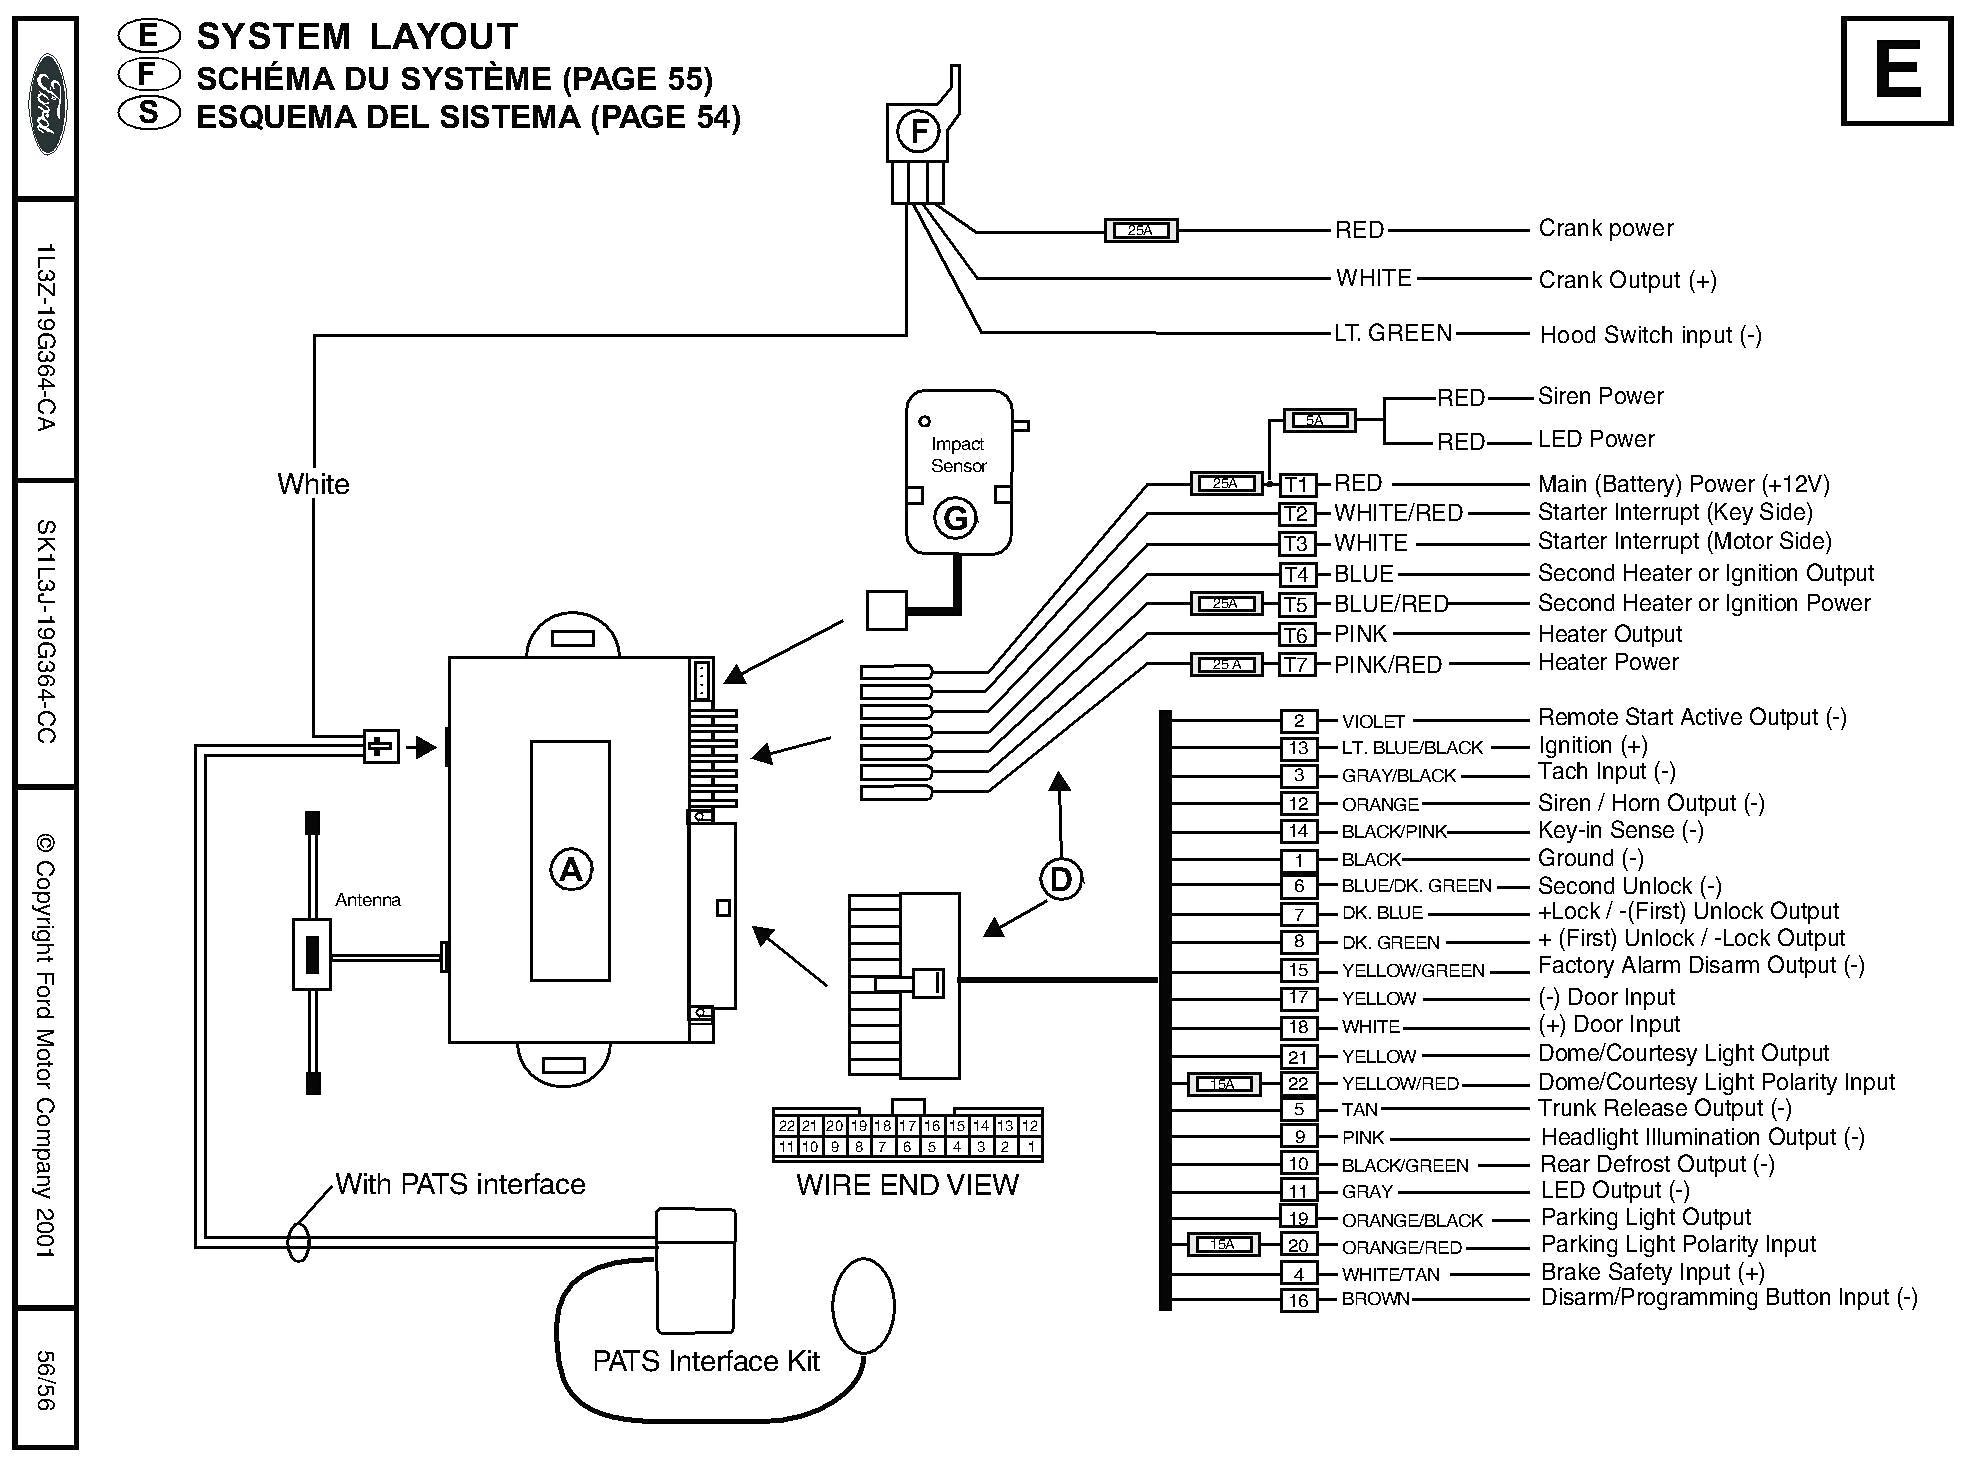 bulldog security wiring diagram john deere 317 ignition switch car diagrams for code alarm